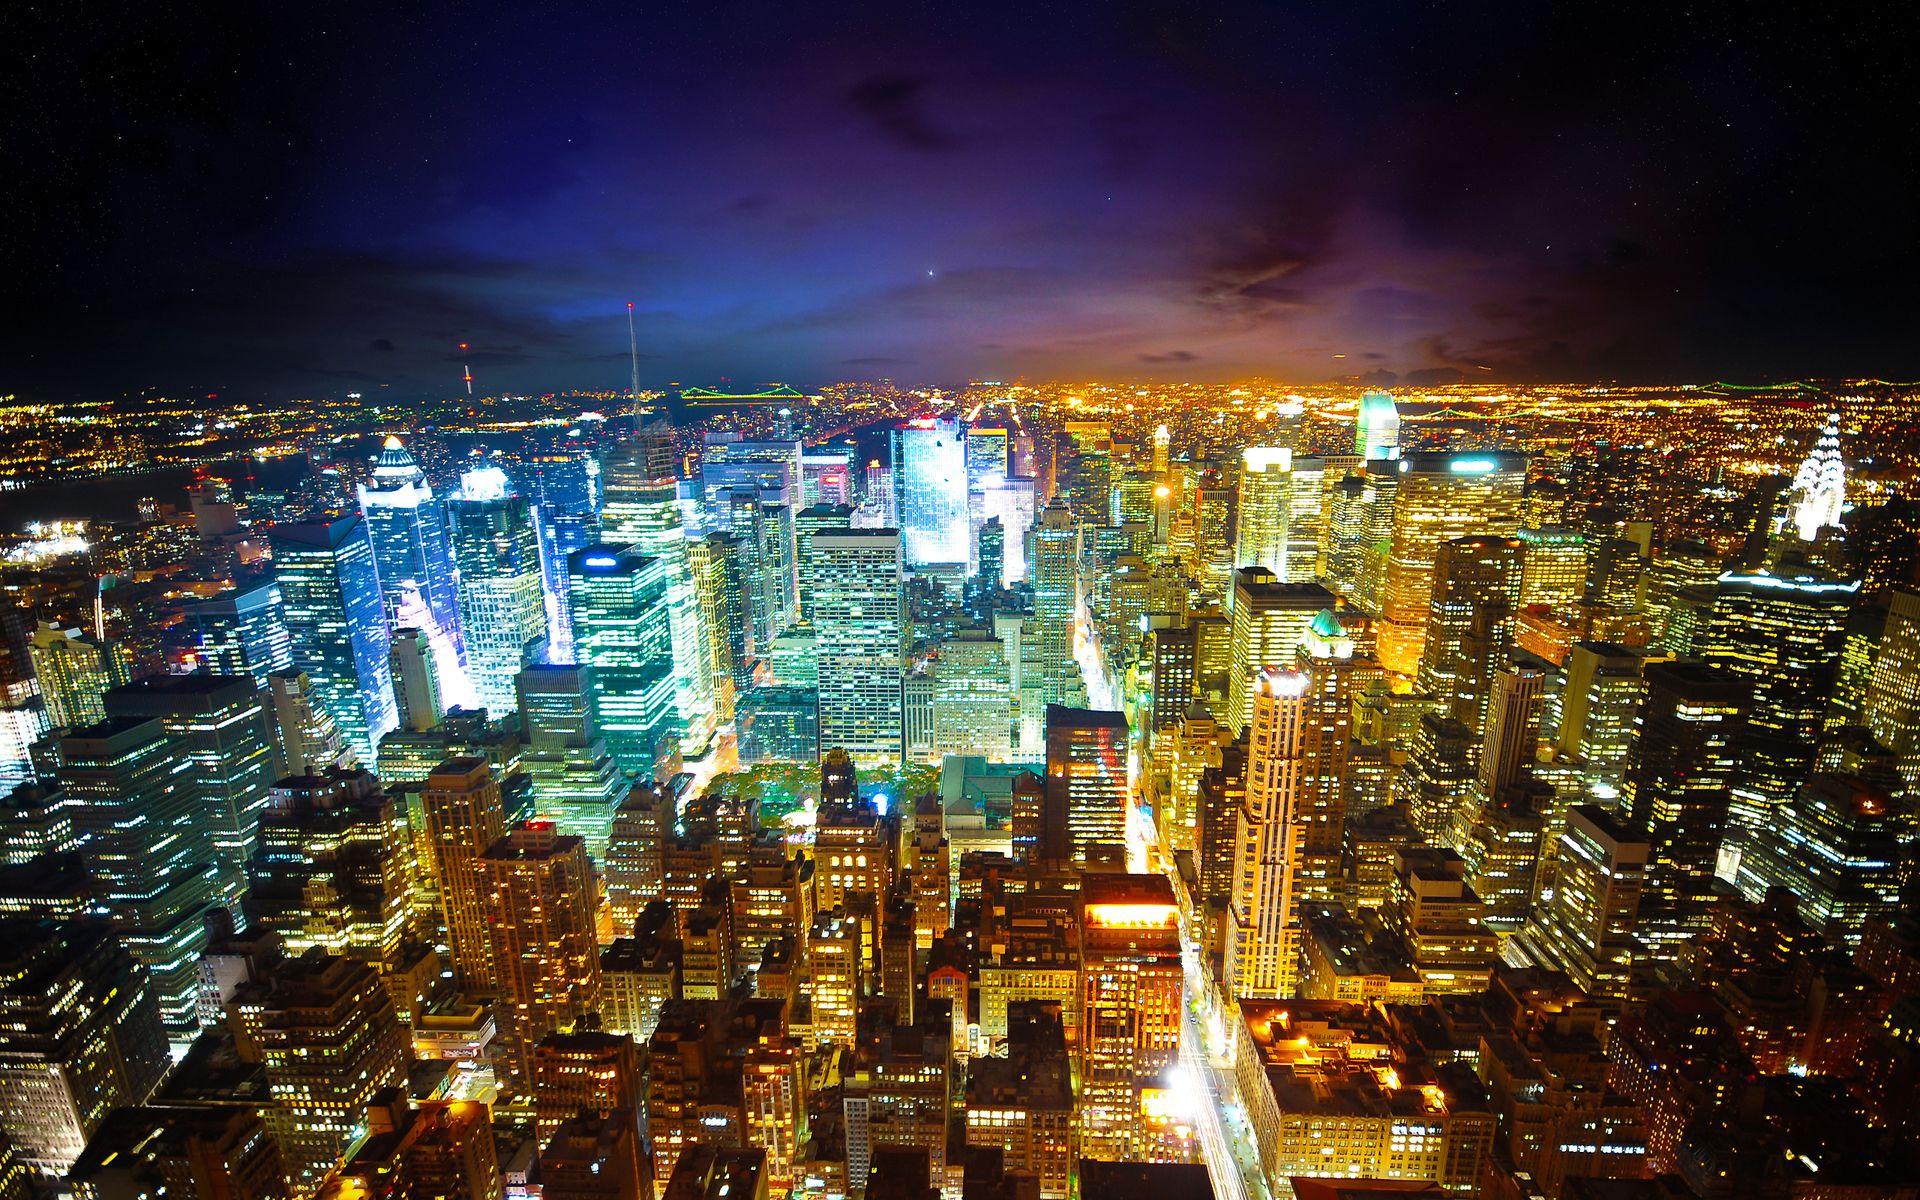 City Lights HD Wallpaper 1920x1200